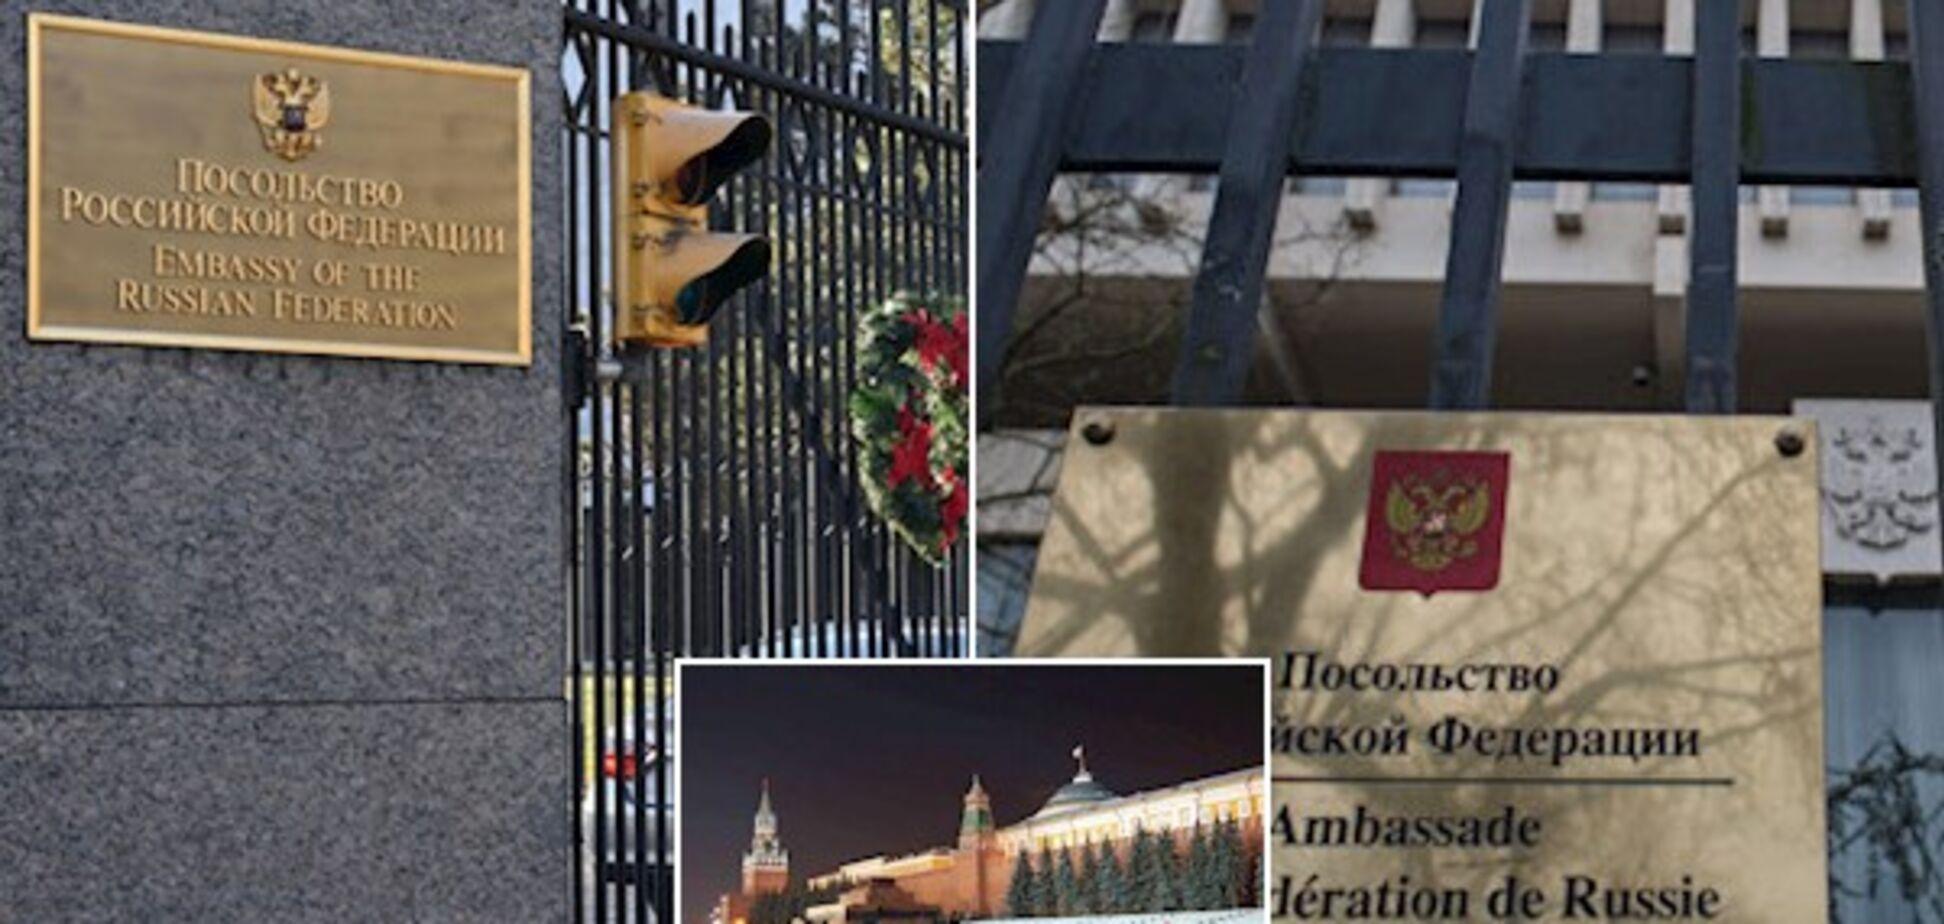 'Путин давно зашел далеко': украинский дипломат указал на прокол Запада